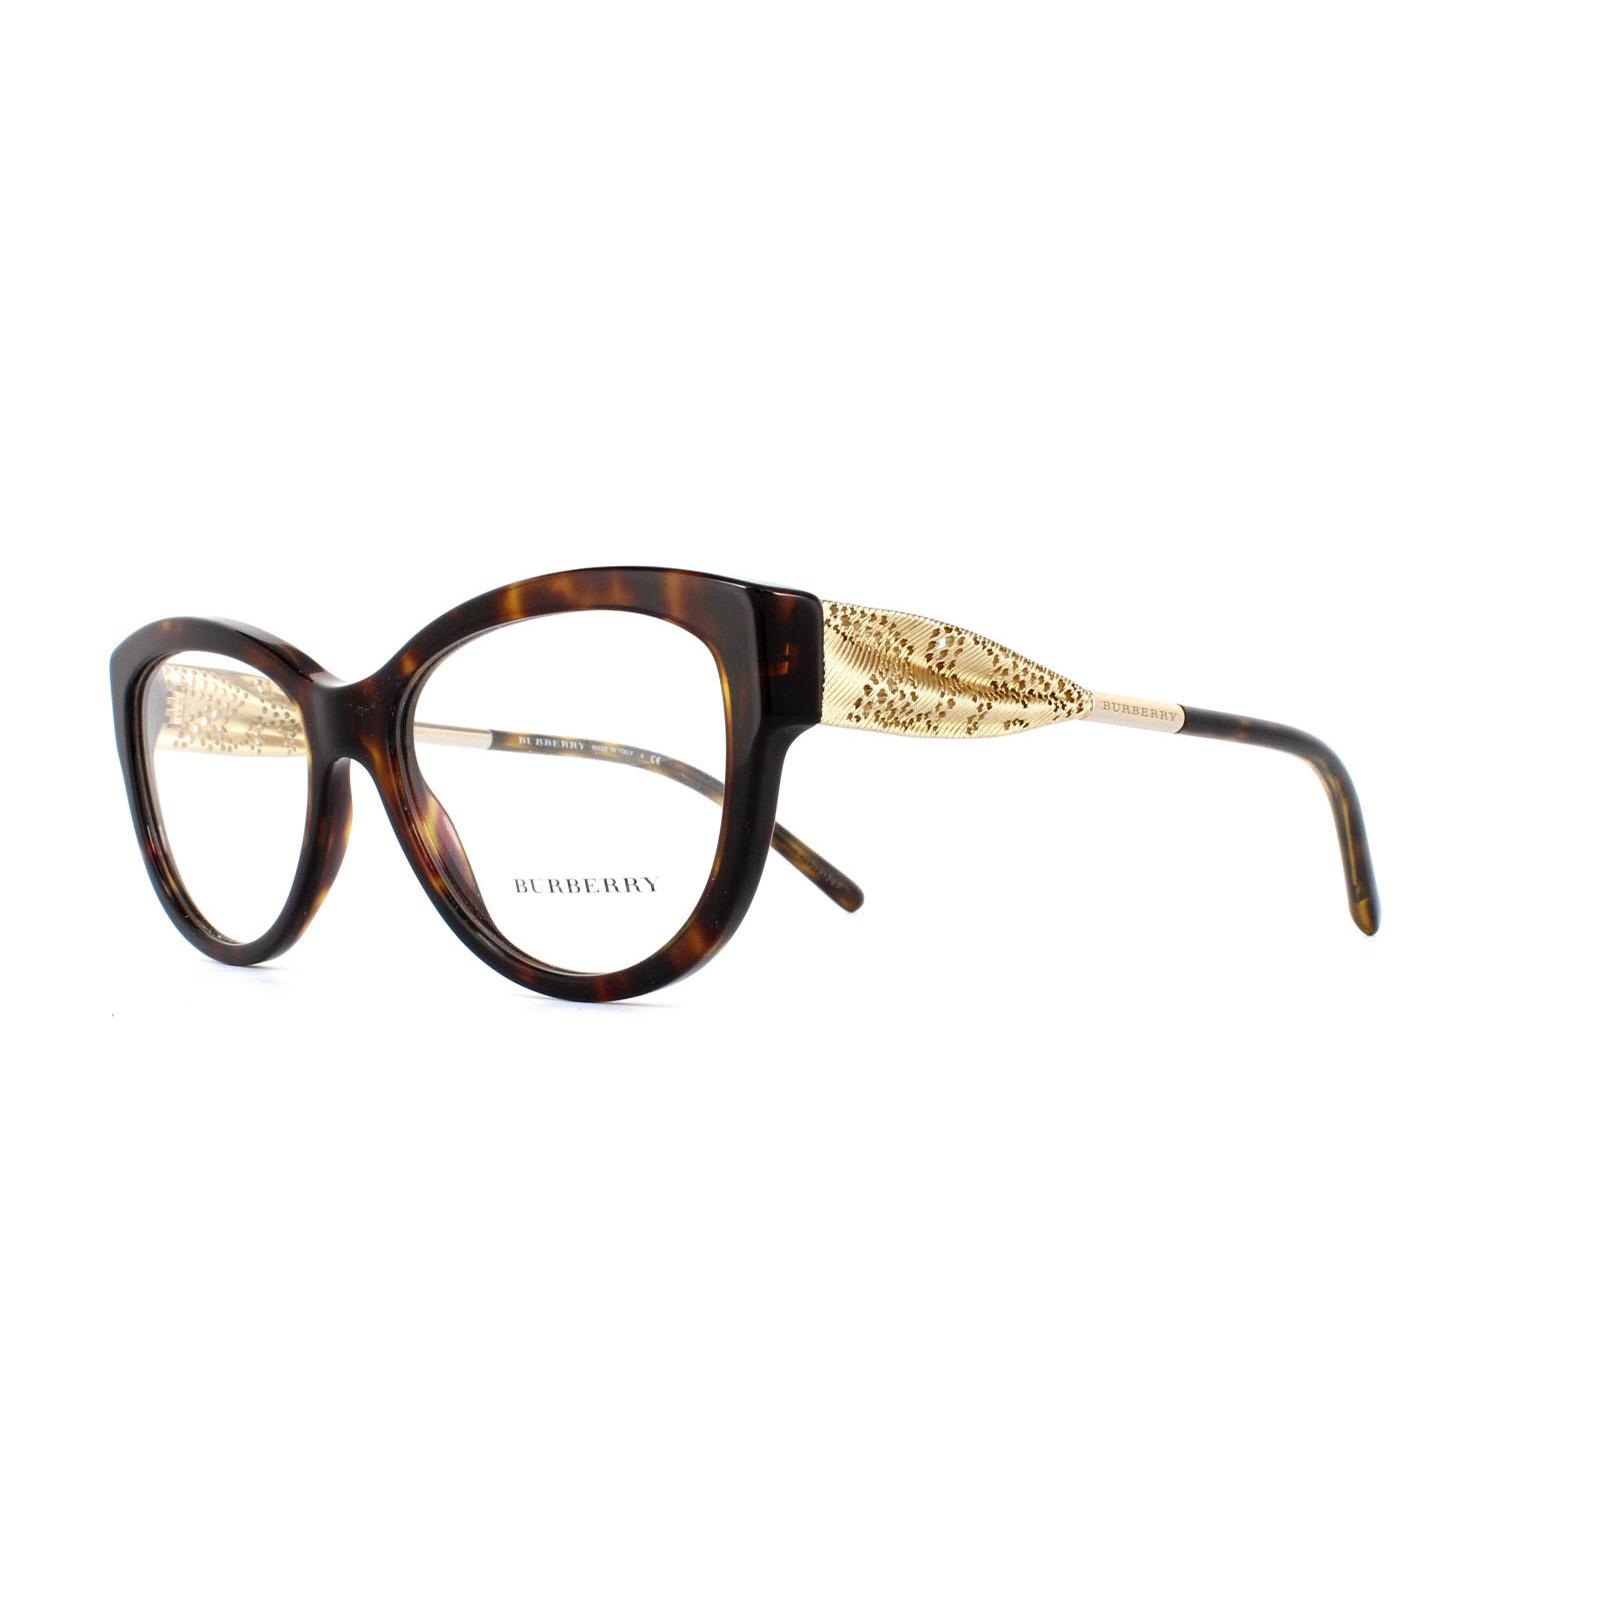 e7d8906ac0a Sentinel Burberry Glasses Frames 2210 3002 Dark Havana Womens 51mm